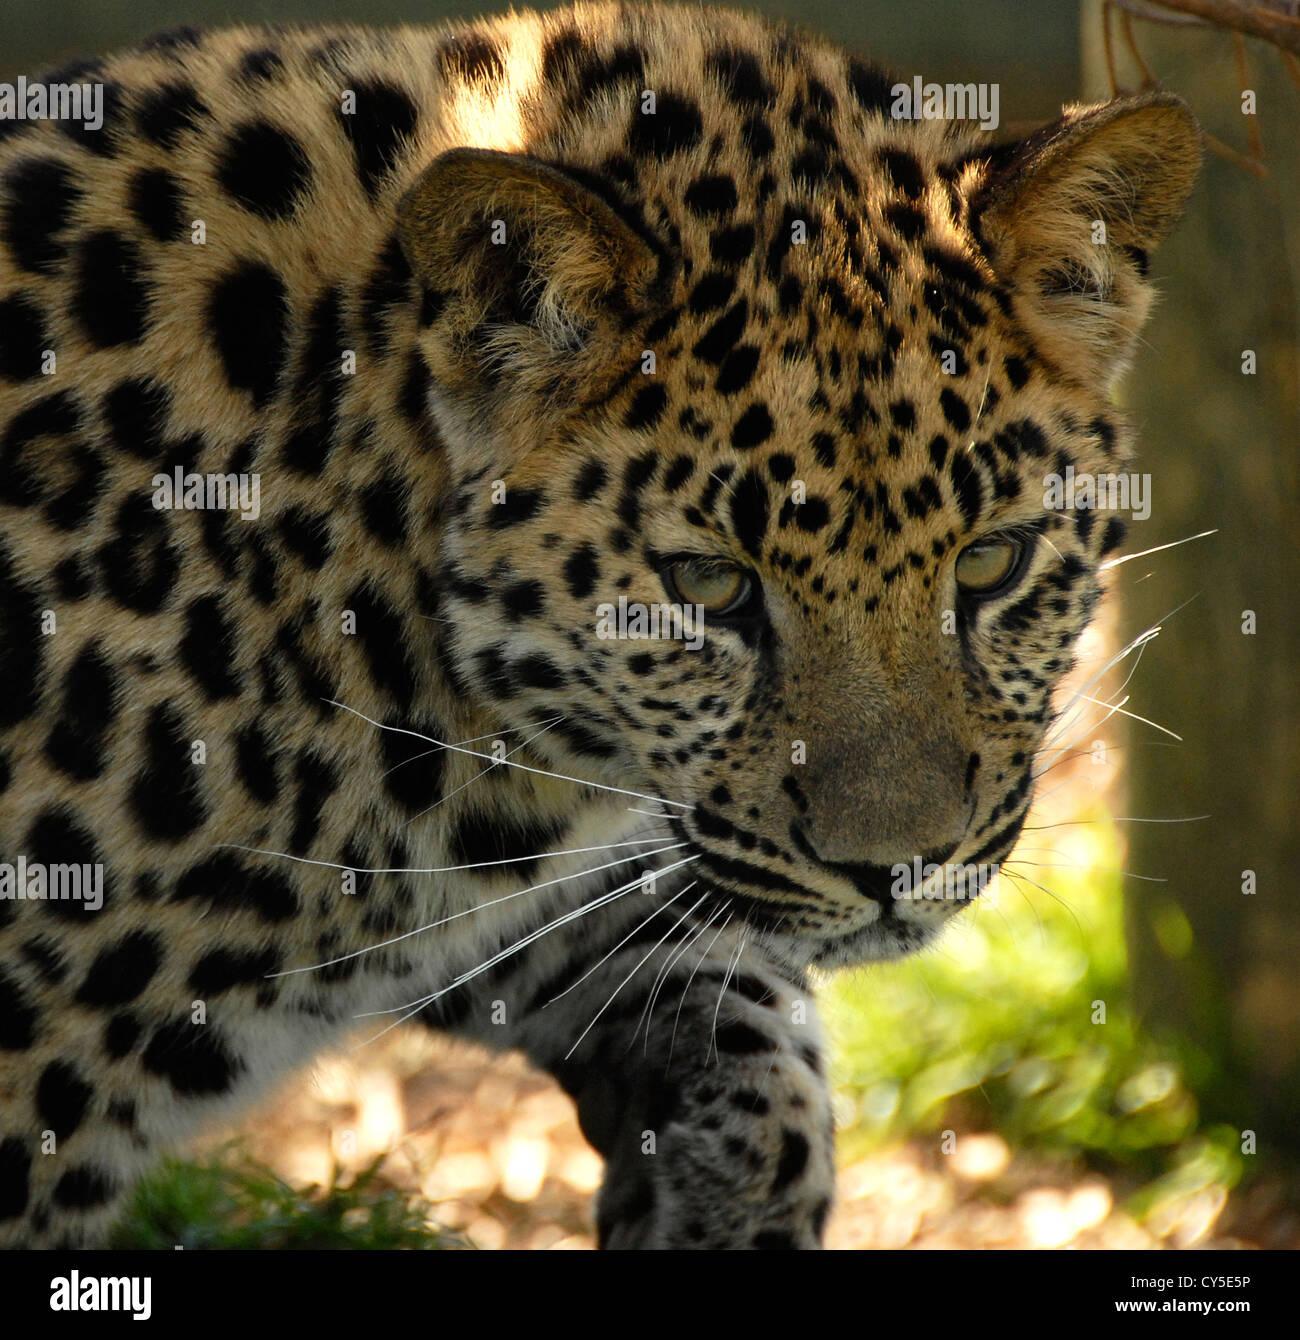 Amur Leopard close up walking and looking toward camera - Stock Image